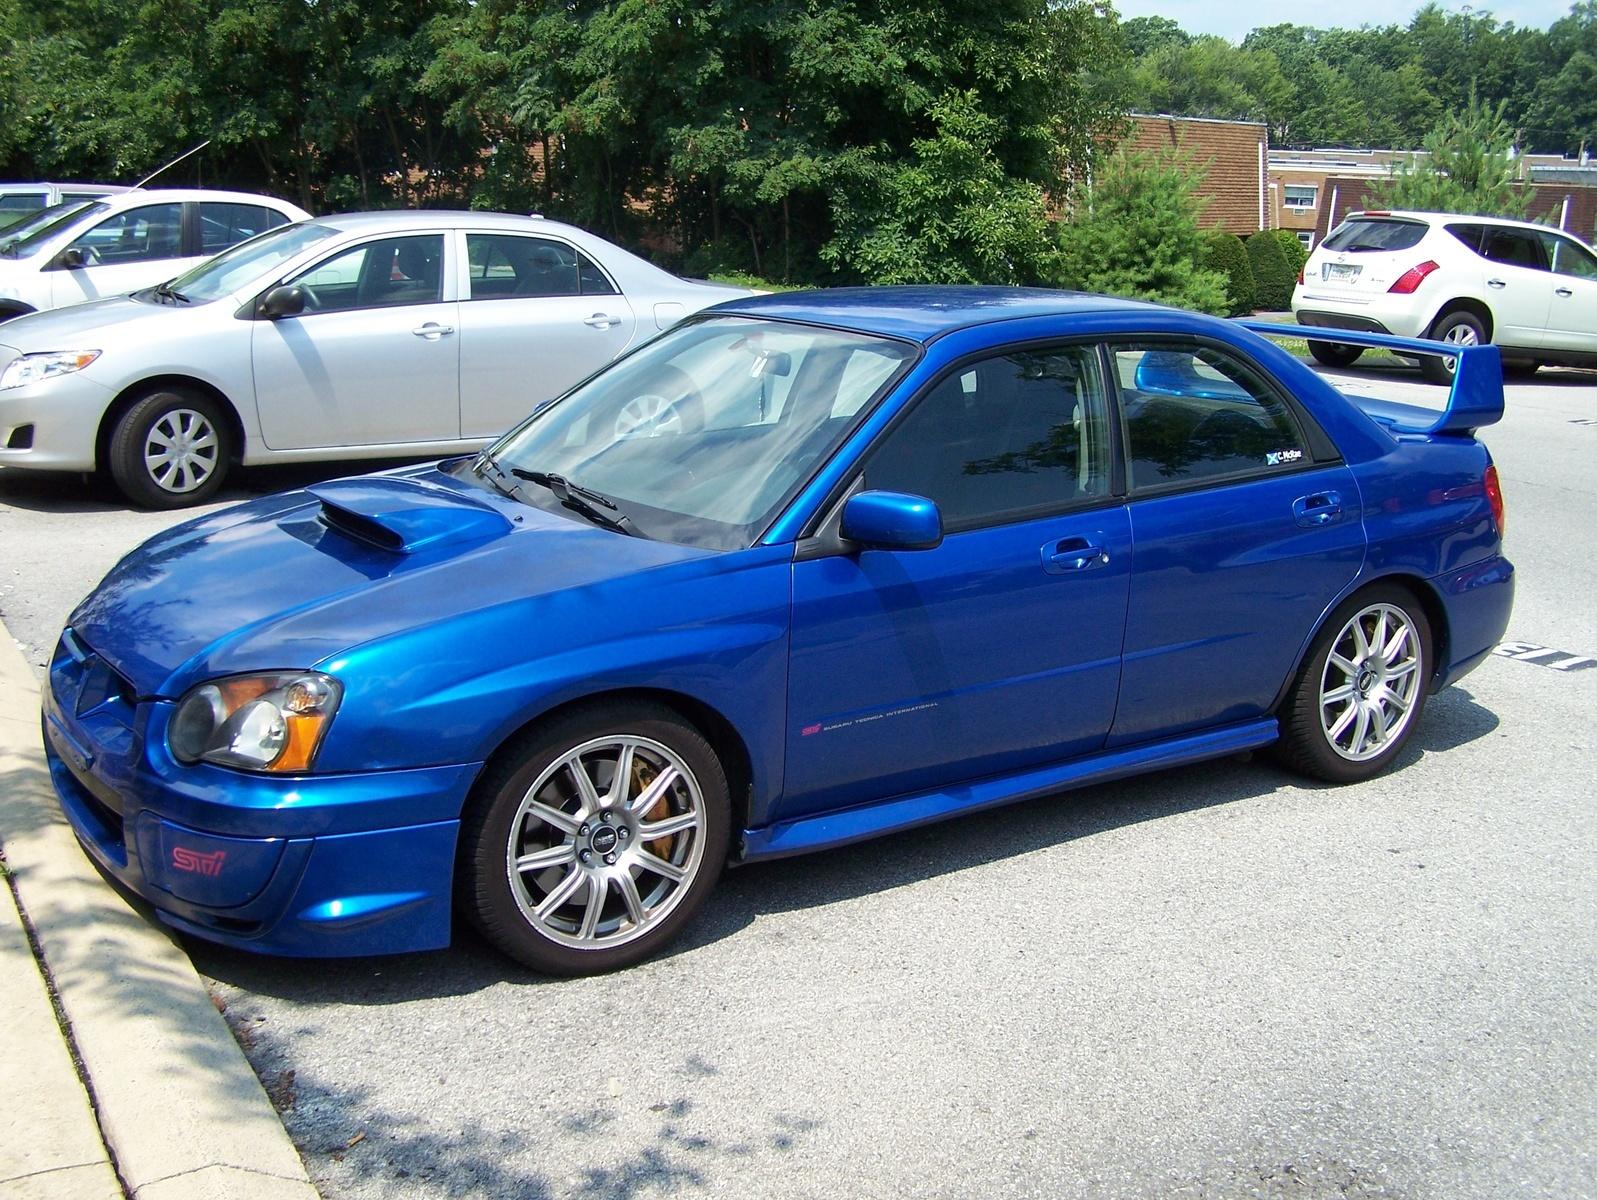 Subaru Impreza Wrx Sti Questions What Year Sti And Color Do U